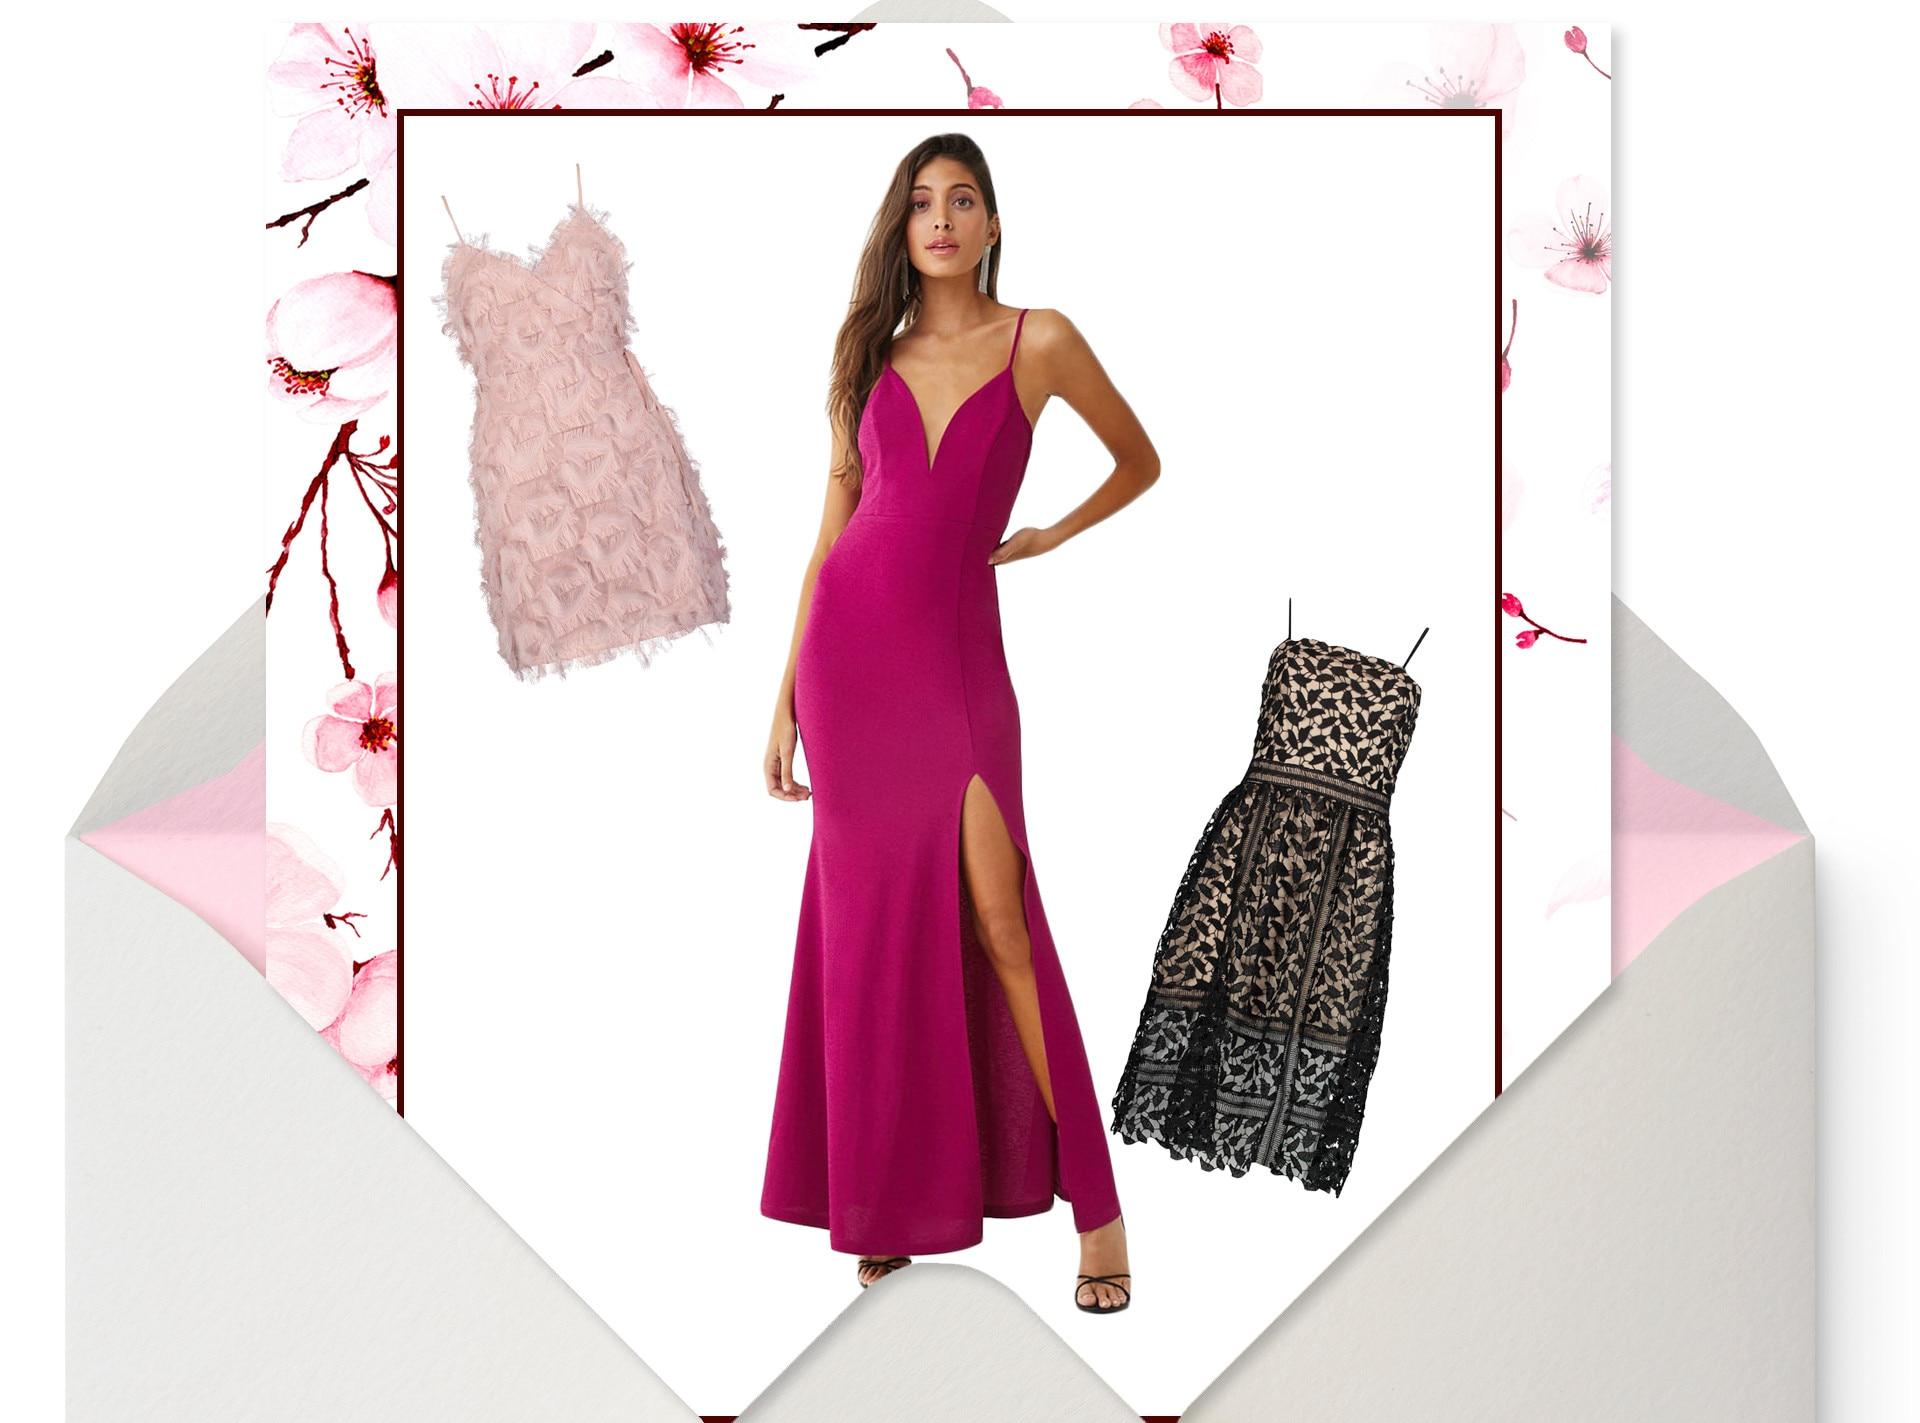 Spring Wedding Guest Dresses Australia 65 Off Awi Com,Wedding Dresses 2020 Lace